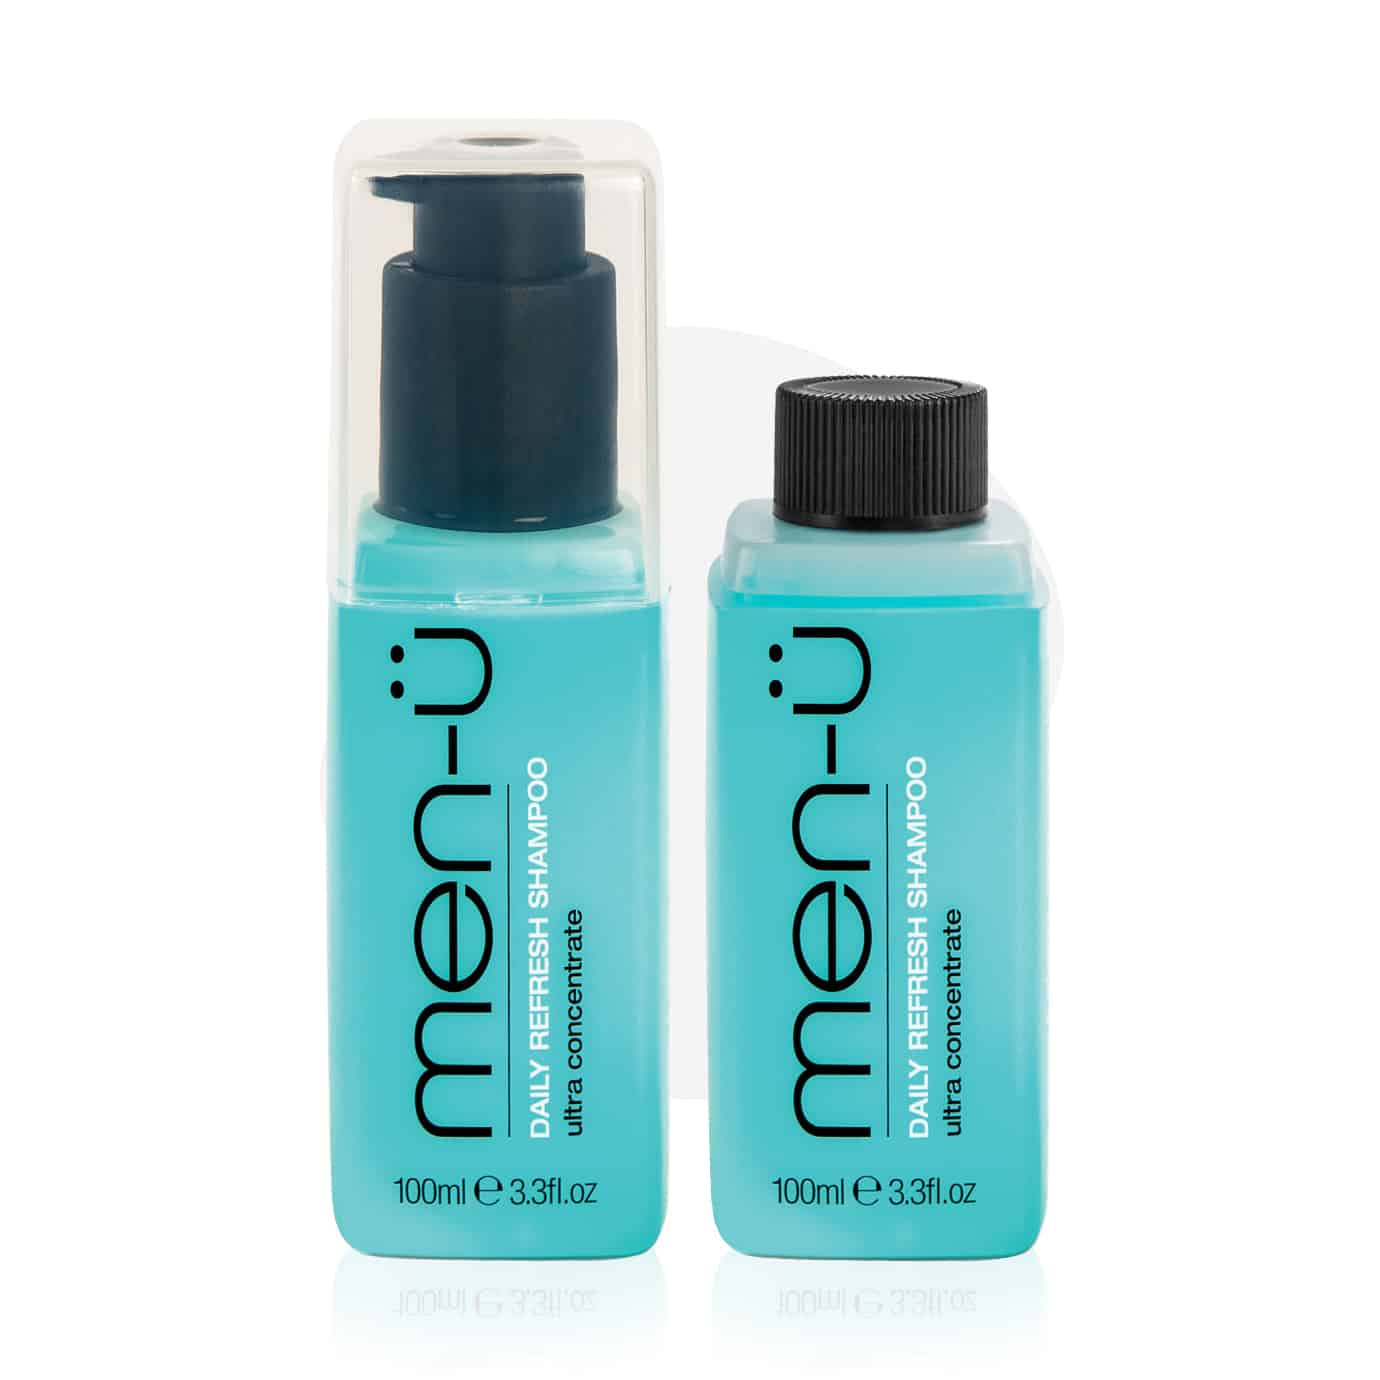 Daily-Refresh-Shampoo-2-types